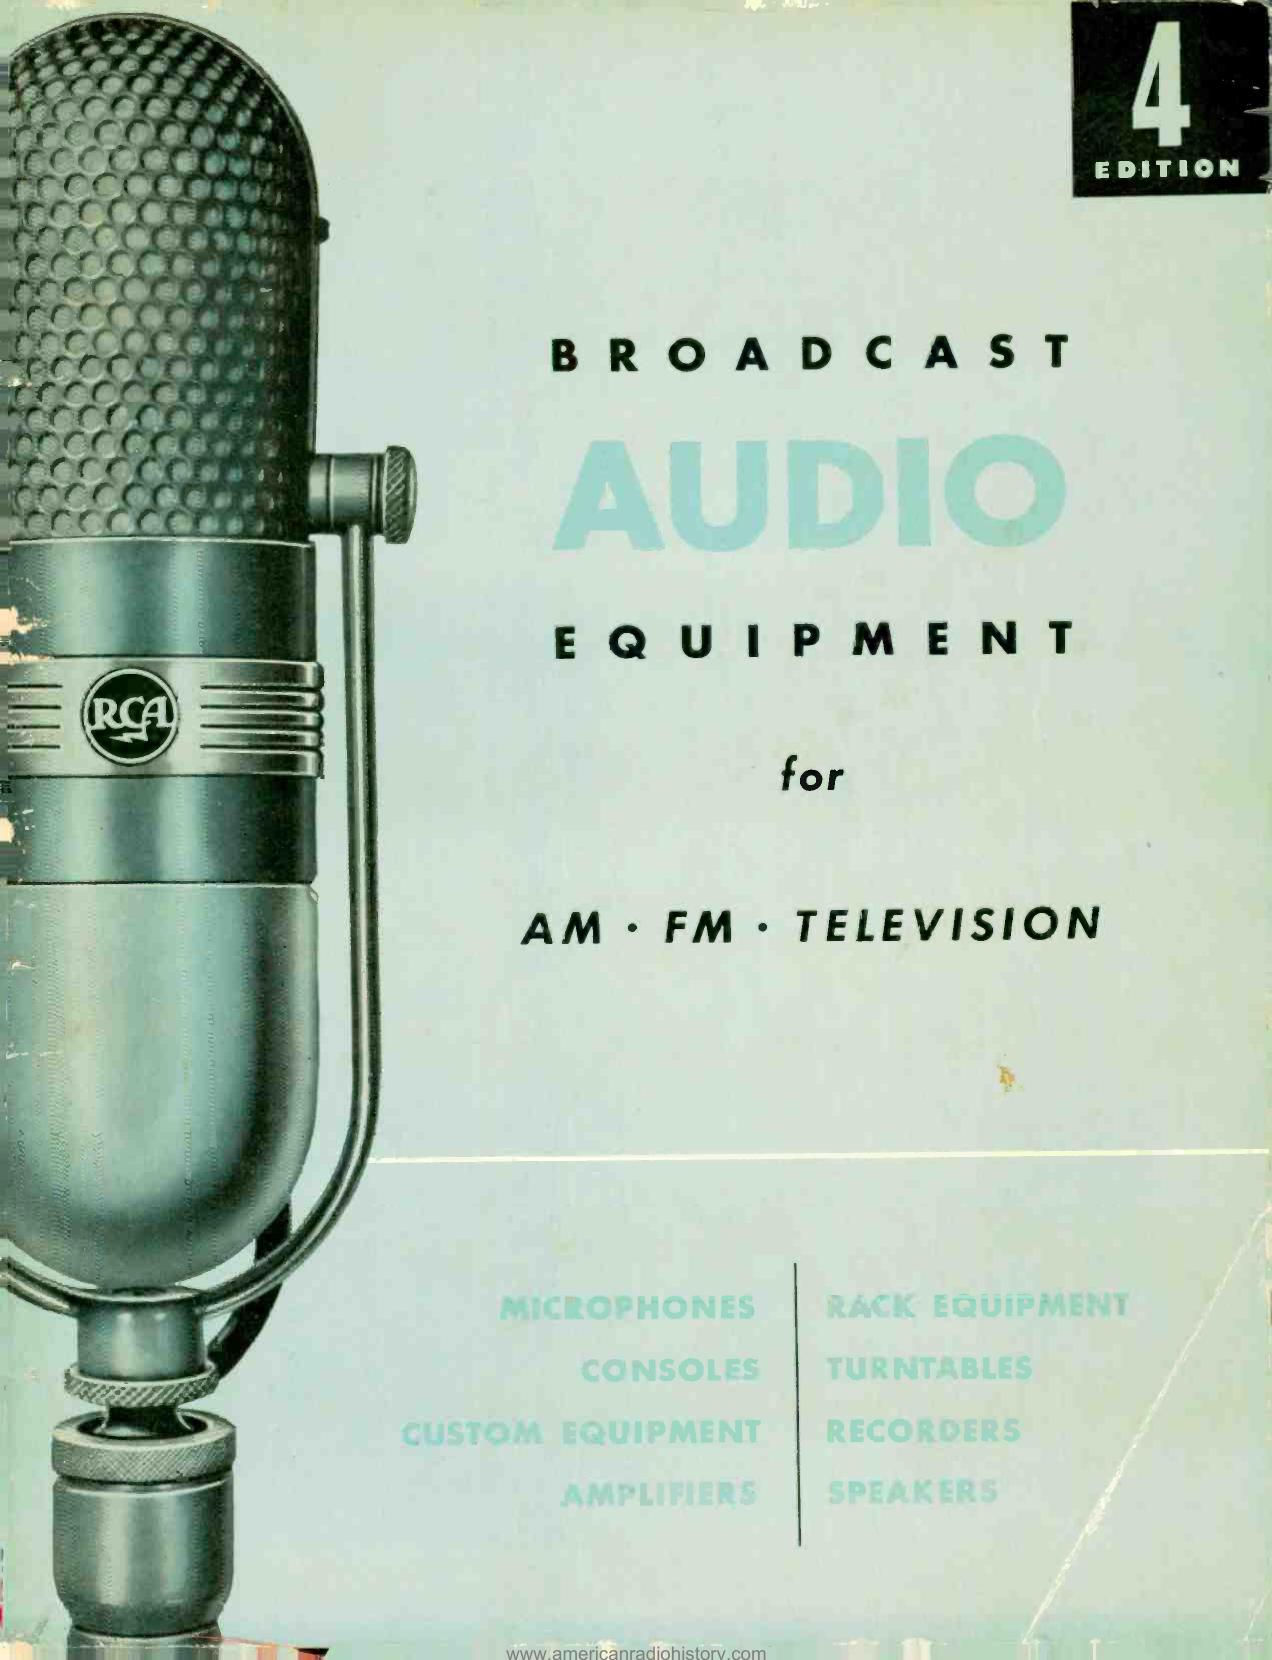 dynamic microphone diagram mi11745 flexible microphone wiring rca general catalog american radio history manualzz com dynamic microphone diagram mi11745 flexible microphone